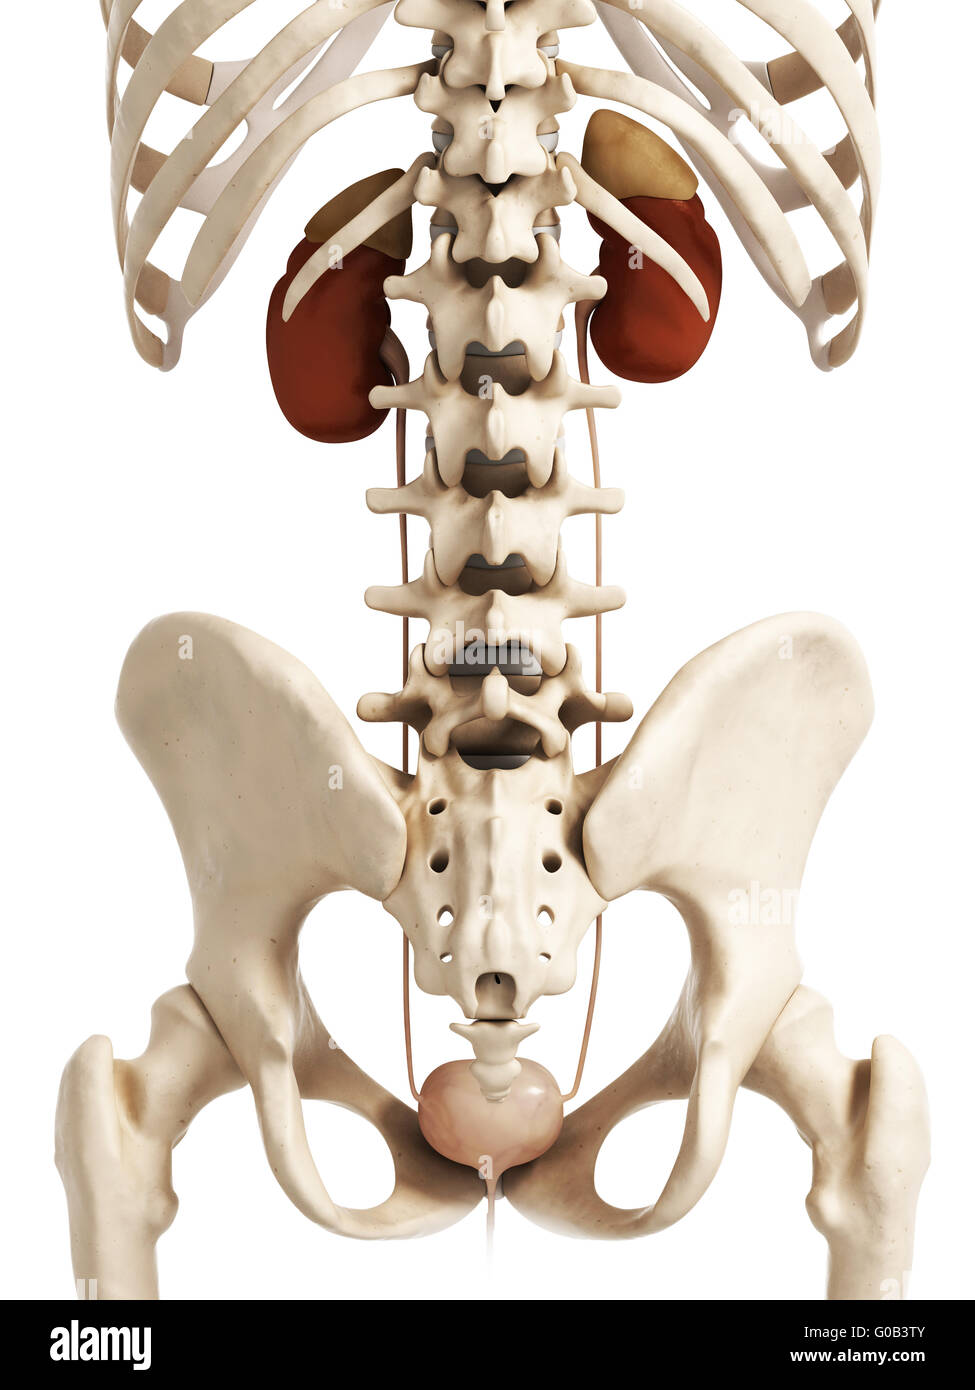 Urinary System Stockfotos & Urinary System Bilder - Alamy